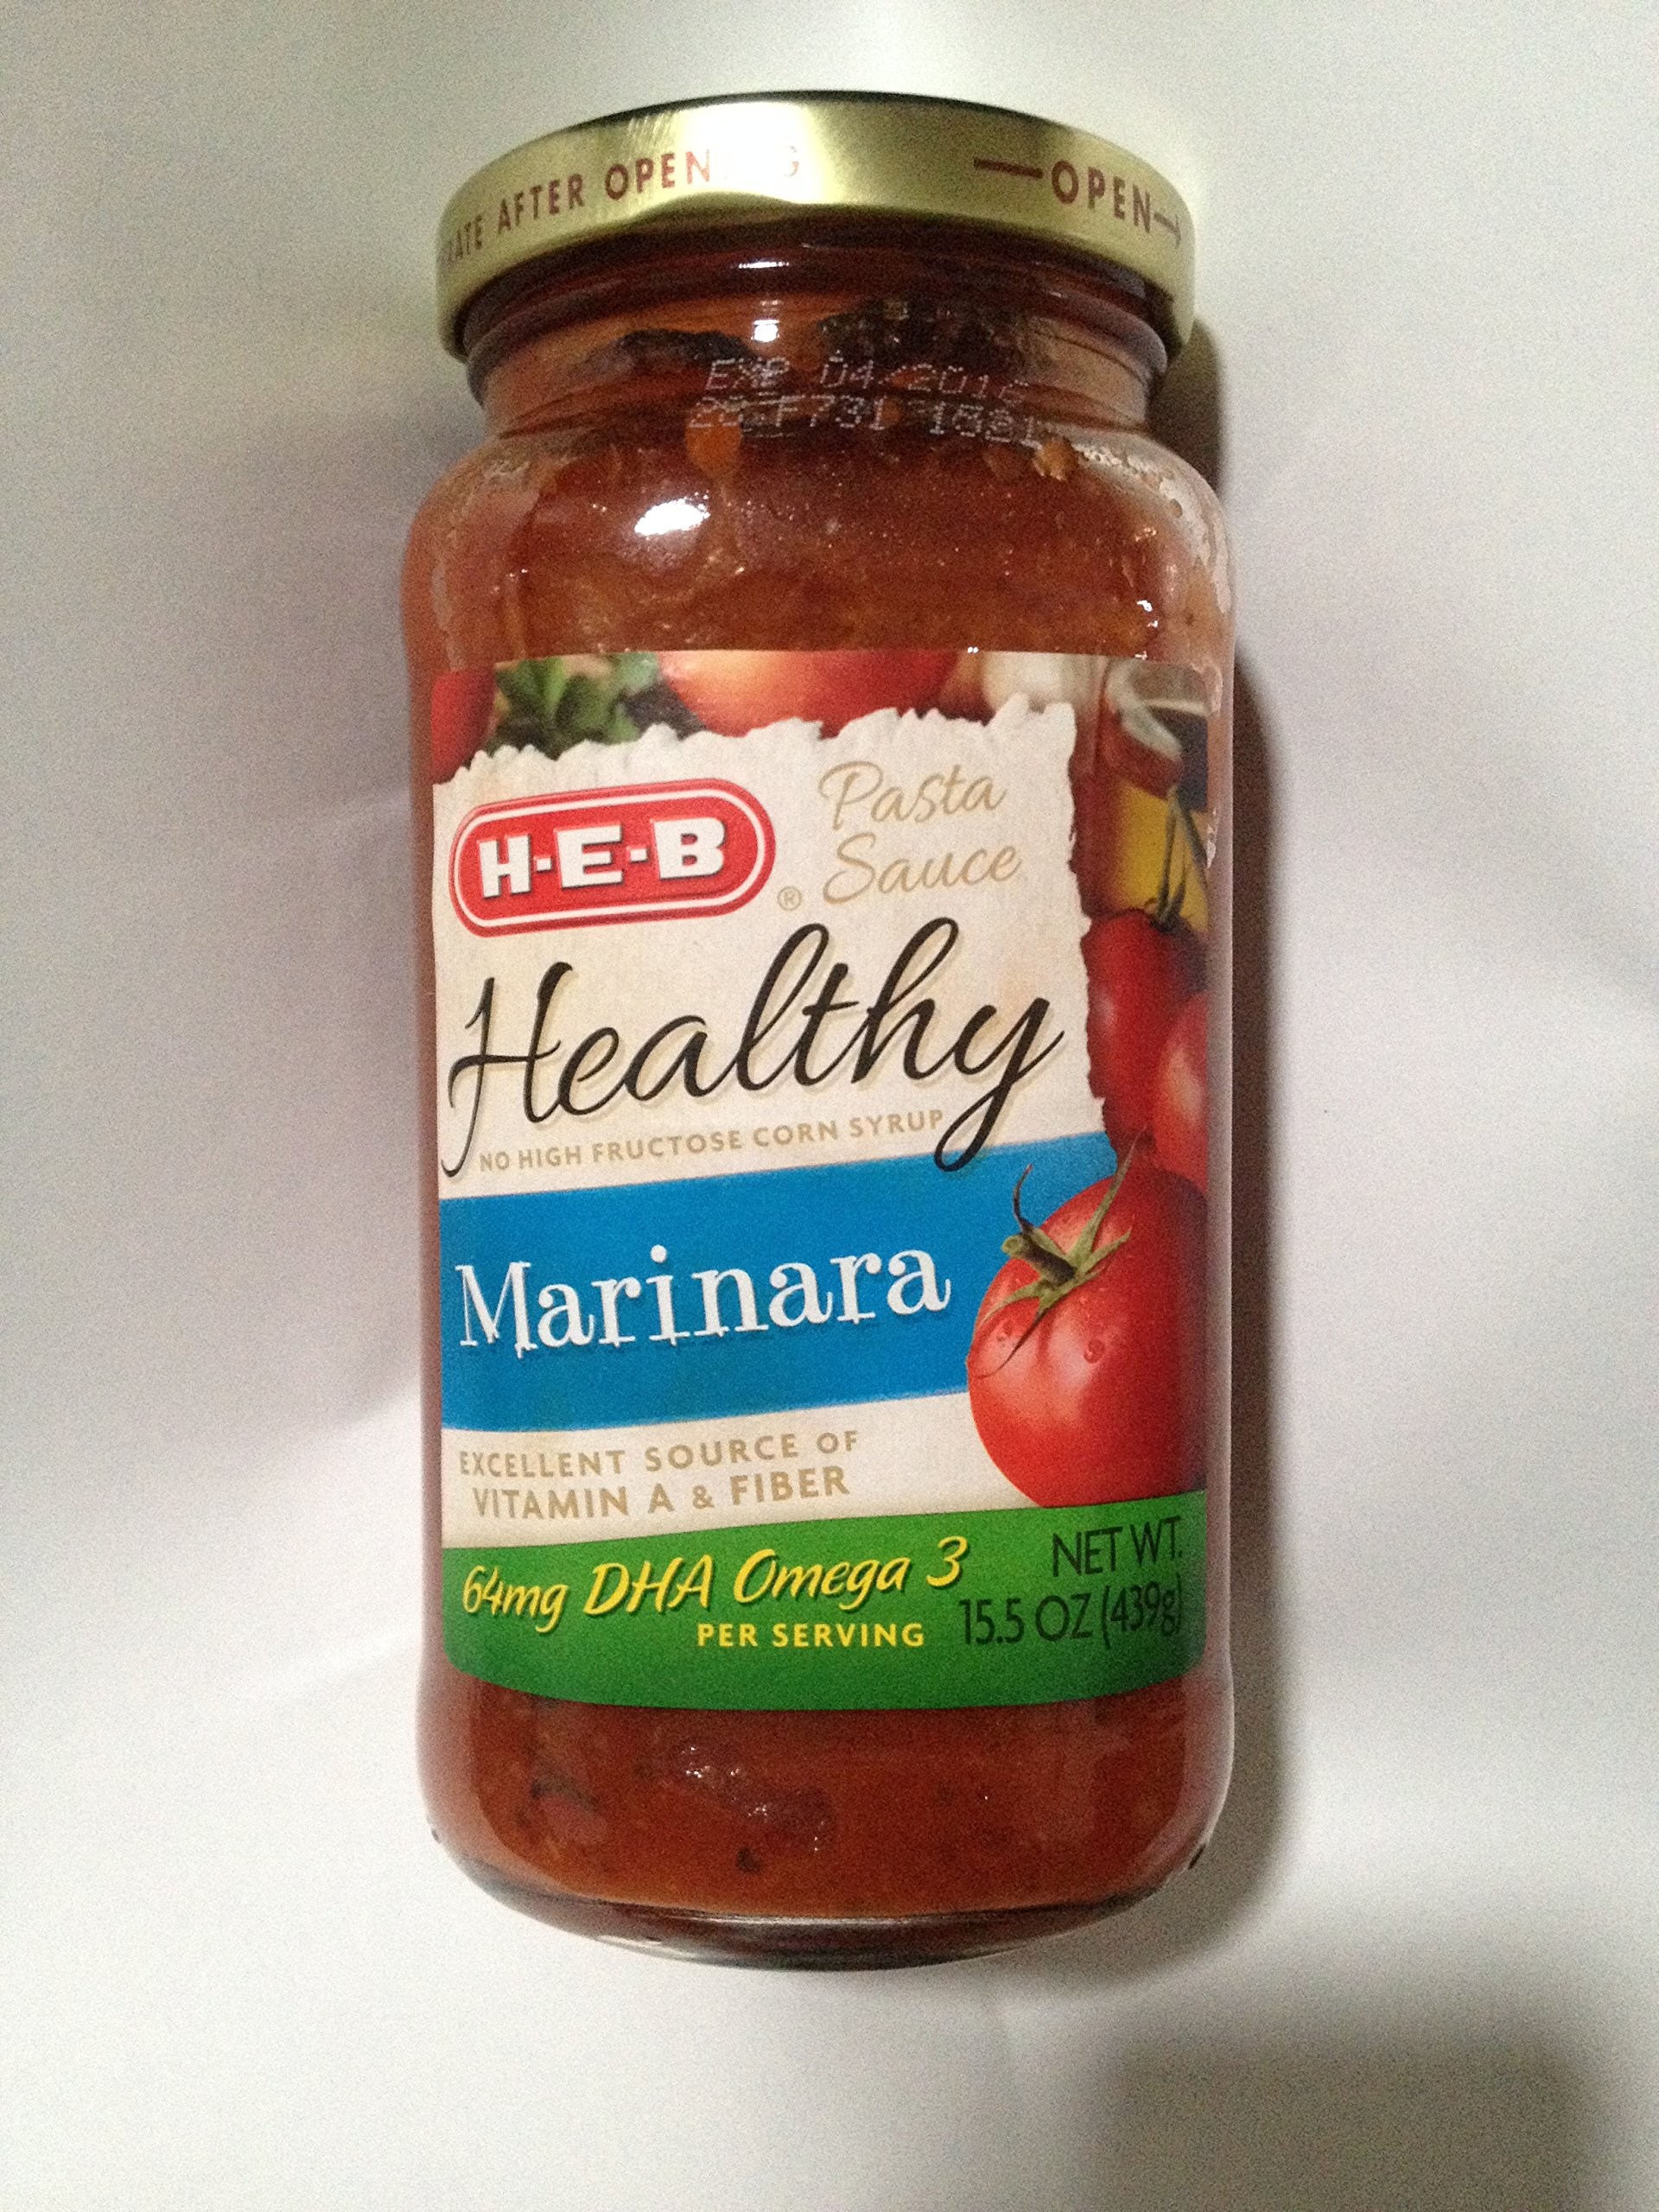 HEB ''Healthy'' (No High Fructose Corn Syrup) Pasta Sauce, Marinara, 15.5 Oz Jar, (Pack of 2)